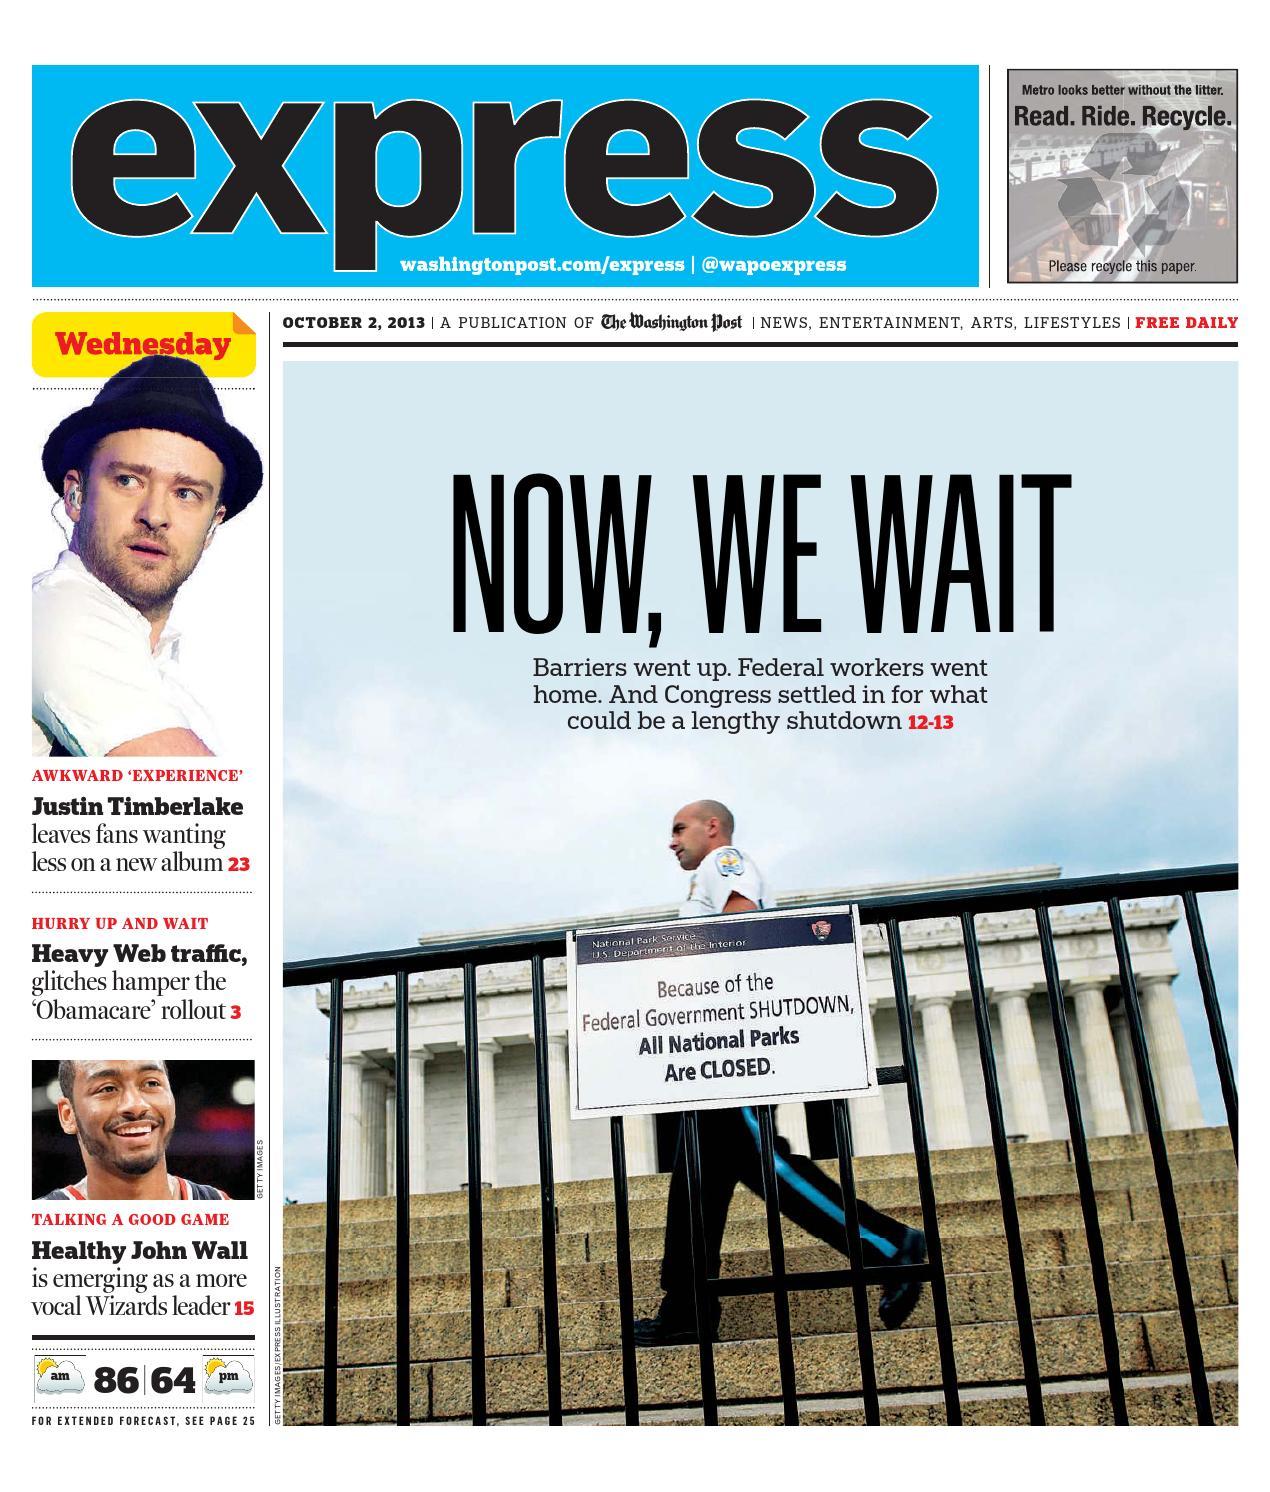 0a445426d802 EXPRESS 10022013 by Express - issuu